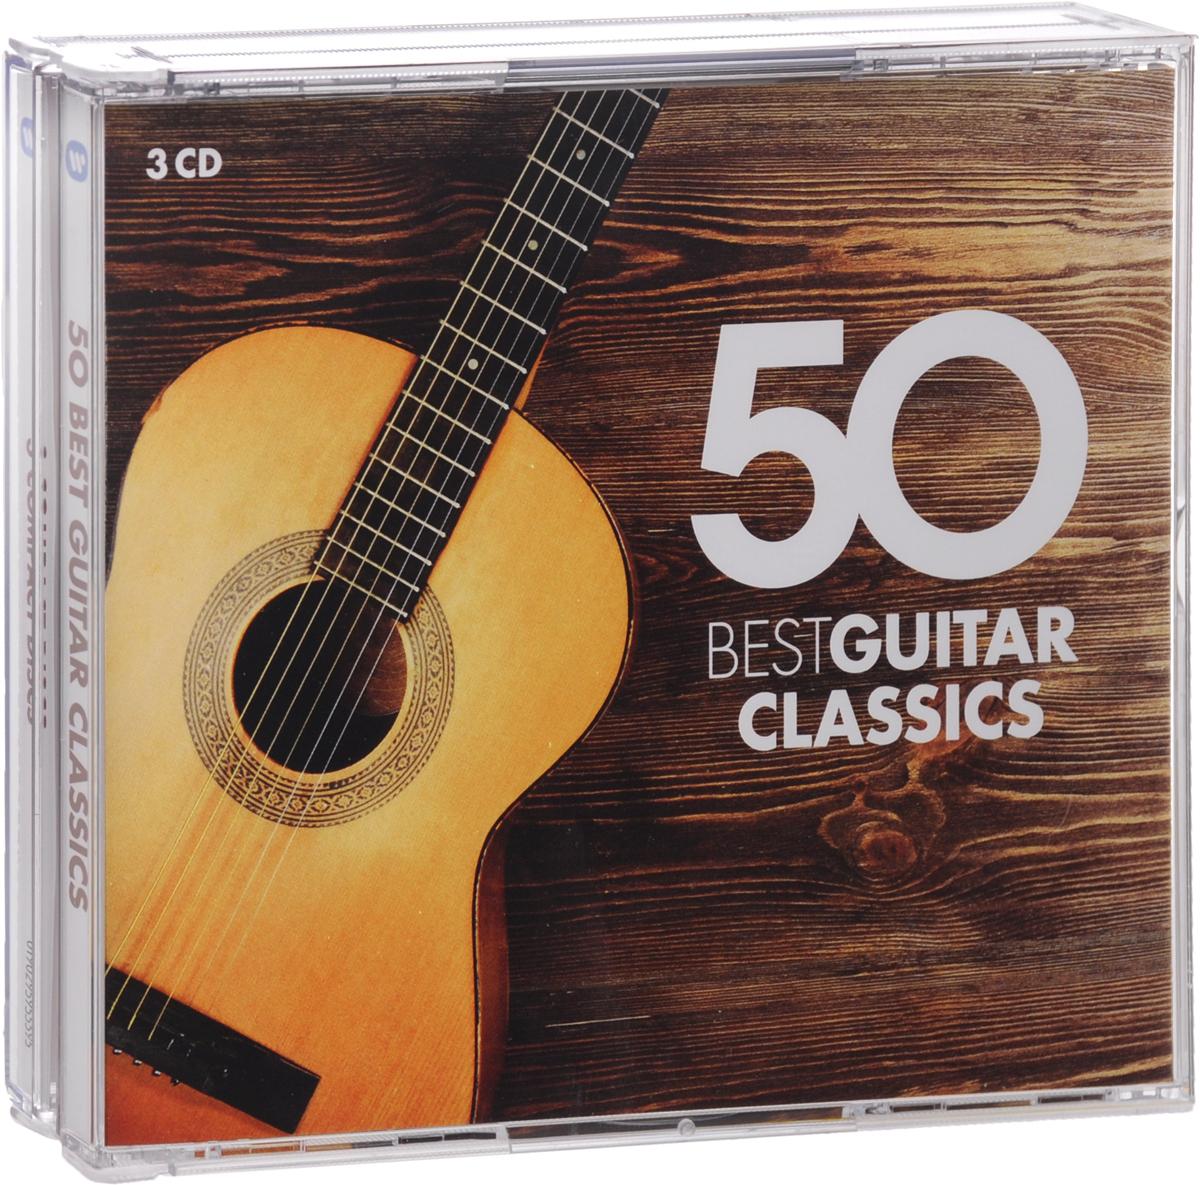 50 Best Guitar Classics (3 CD) cd сборник 100 best guitar classics